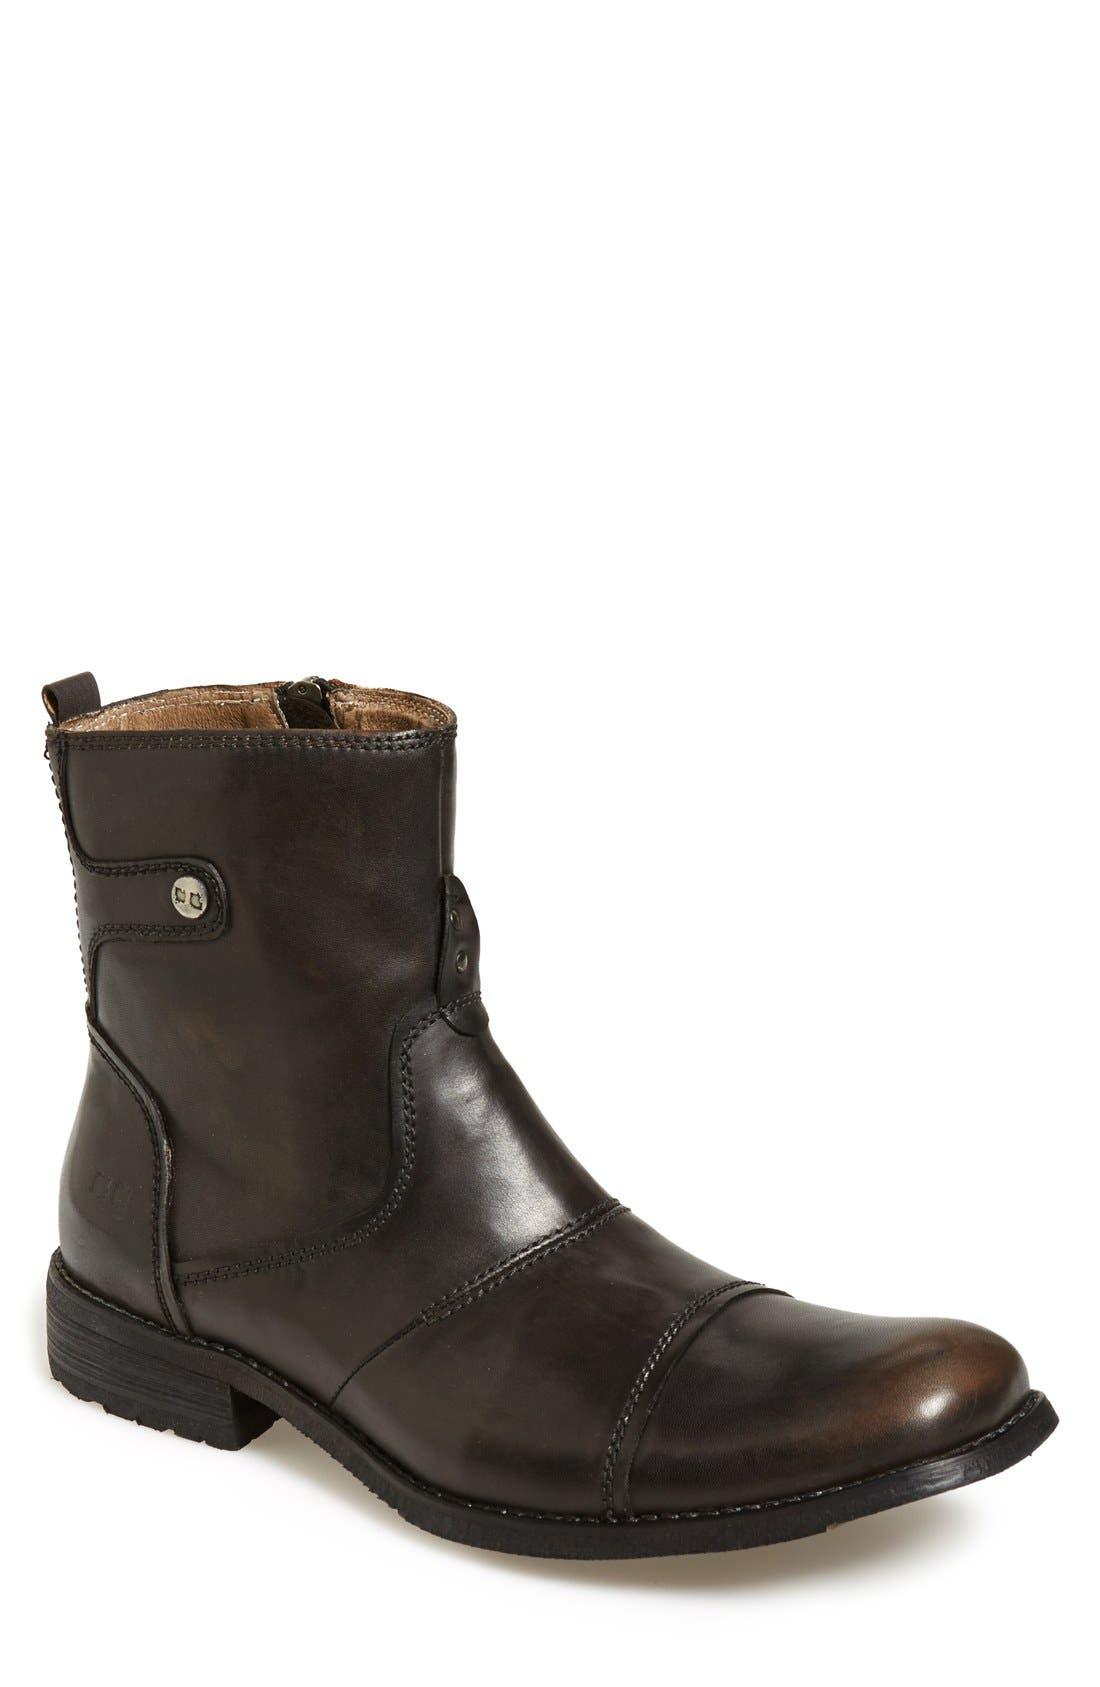 Main Image - Bed Stu 'Burst' Boot (Online Only) (Men)